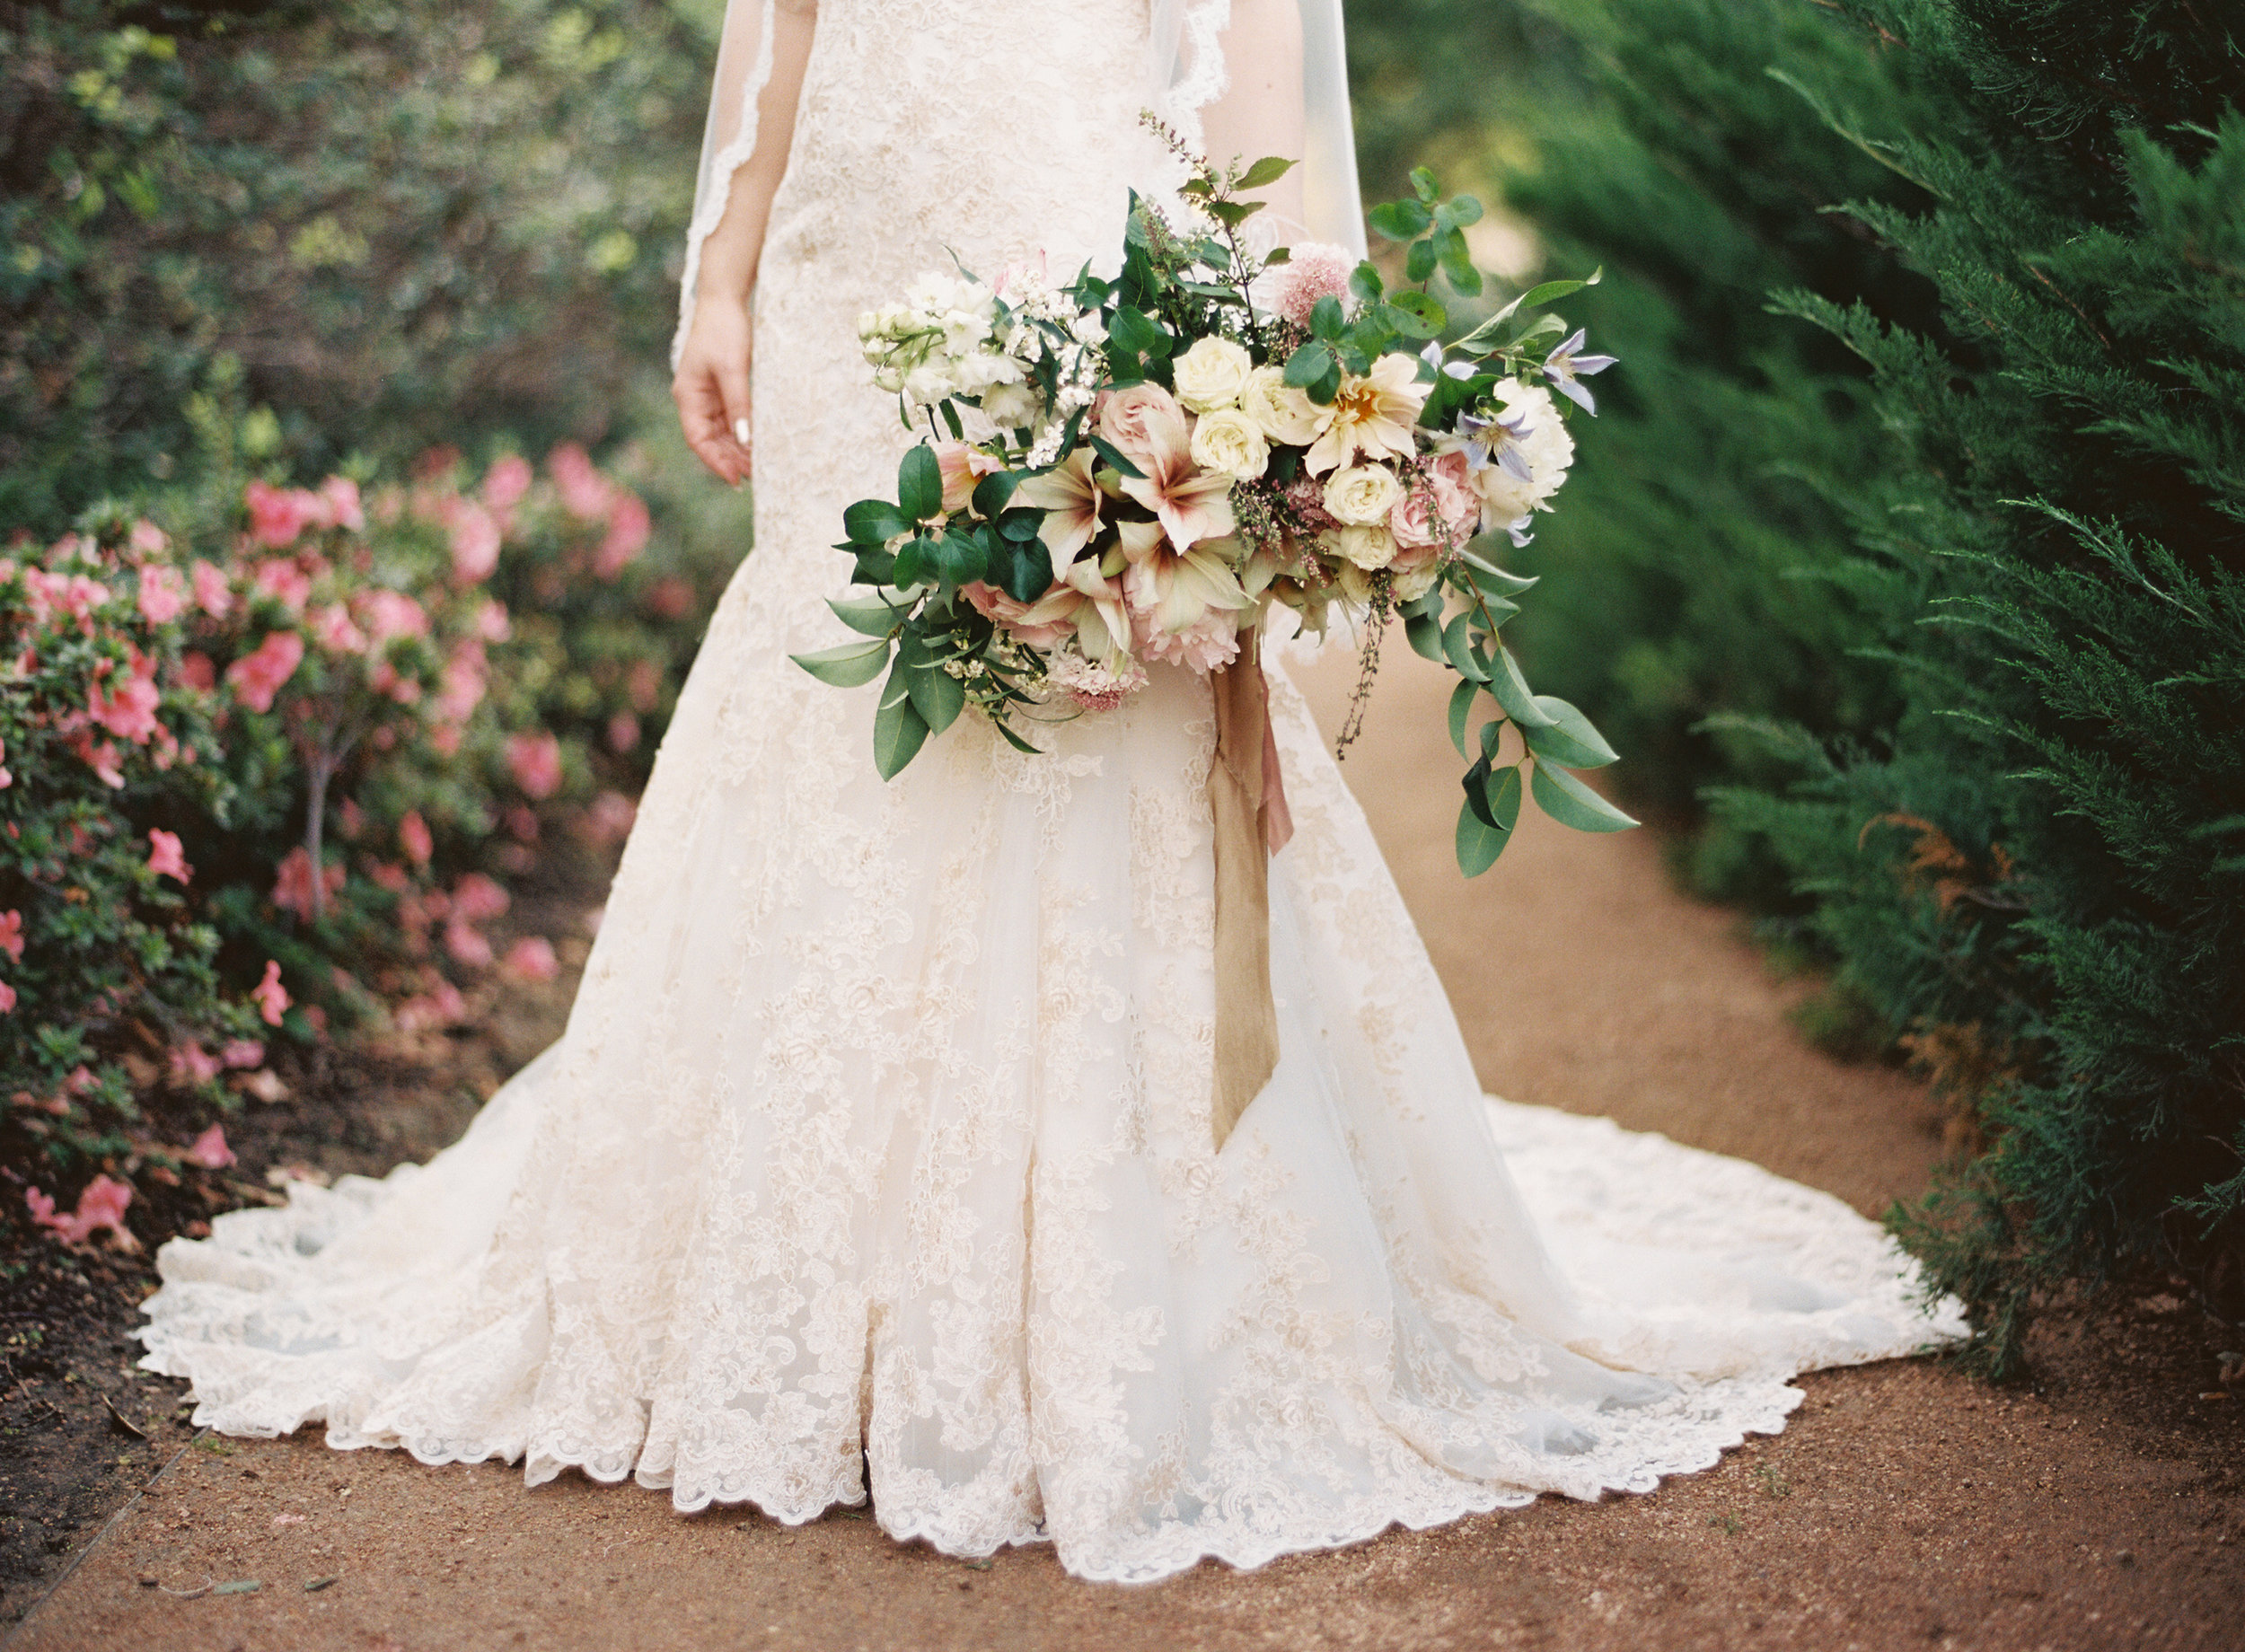 152-KATIE_GARY_WEDDING_FILM.jpg